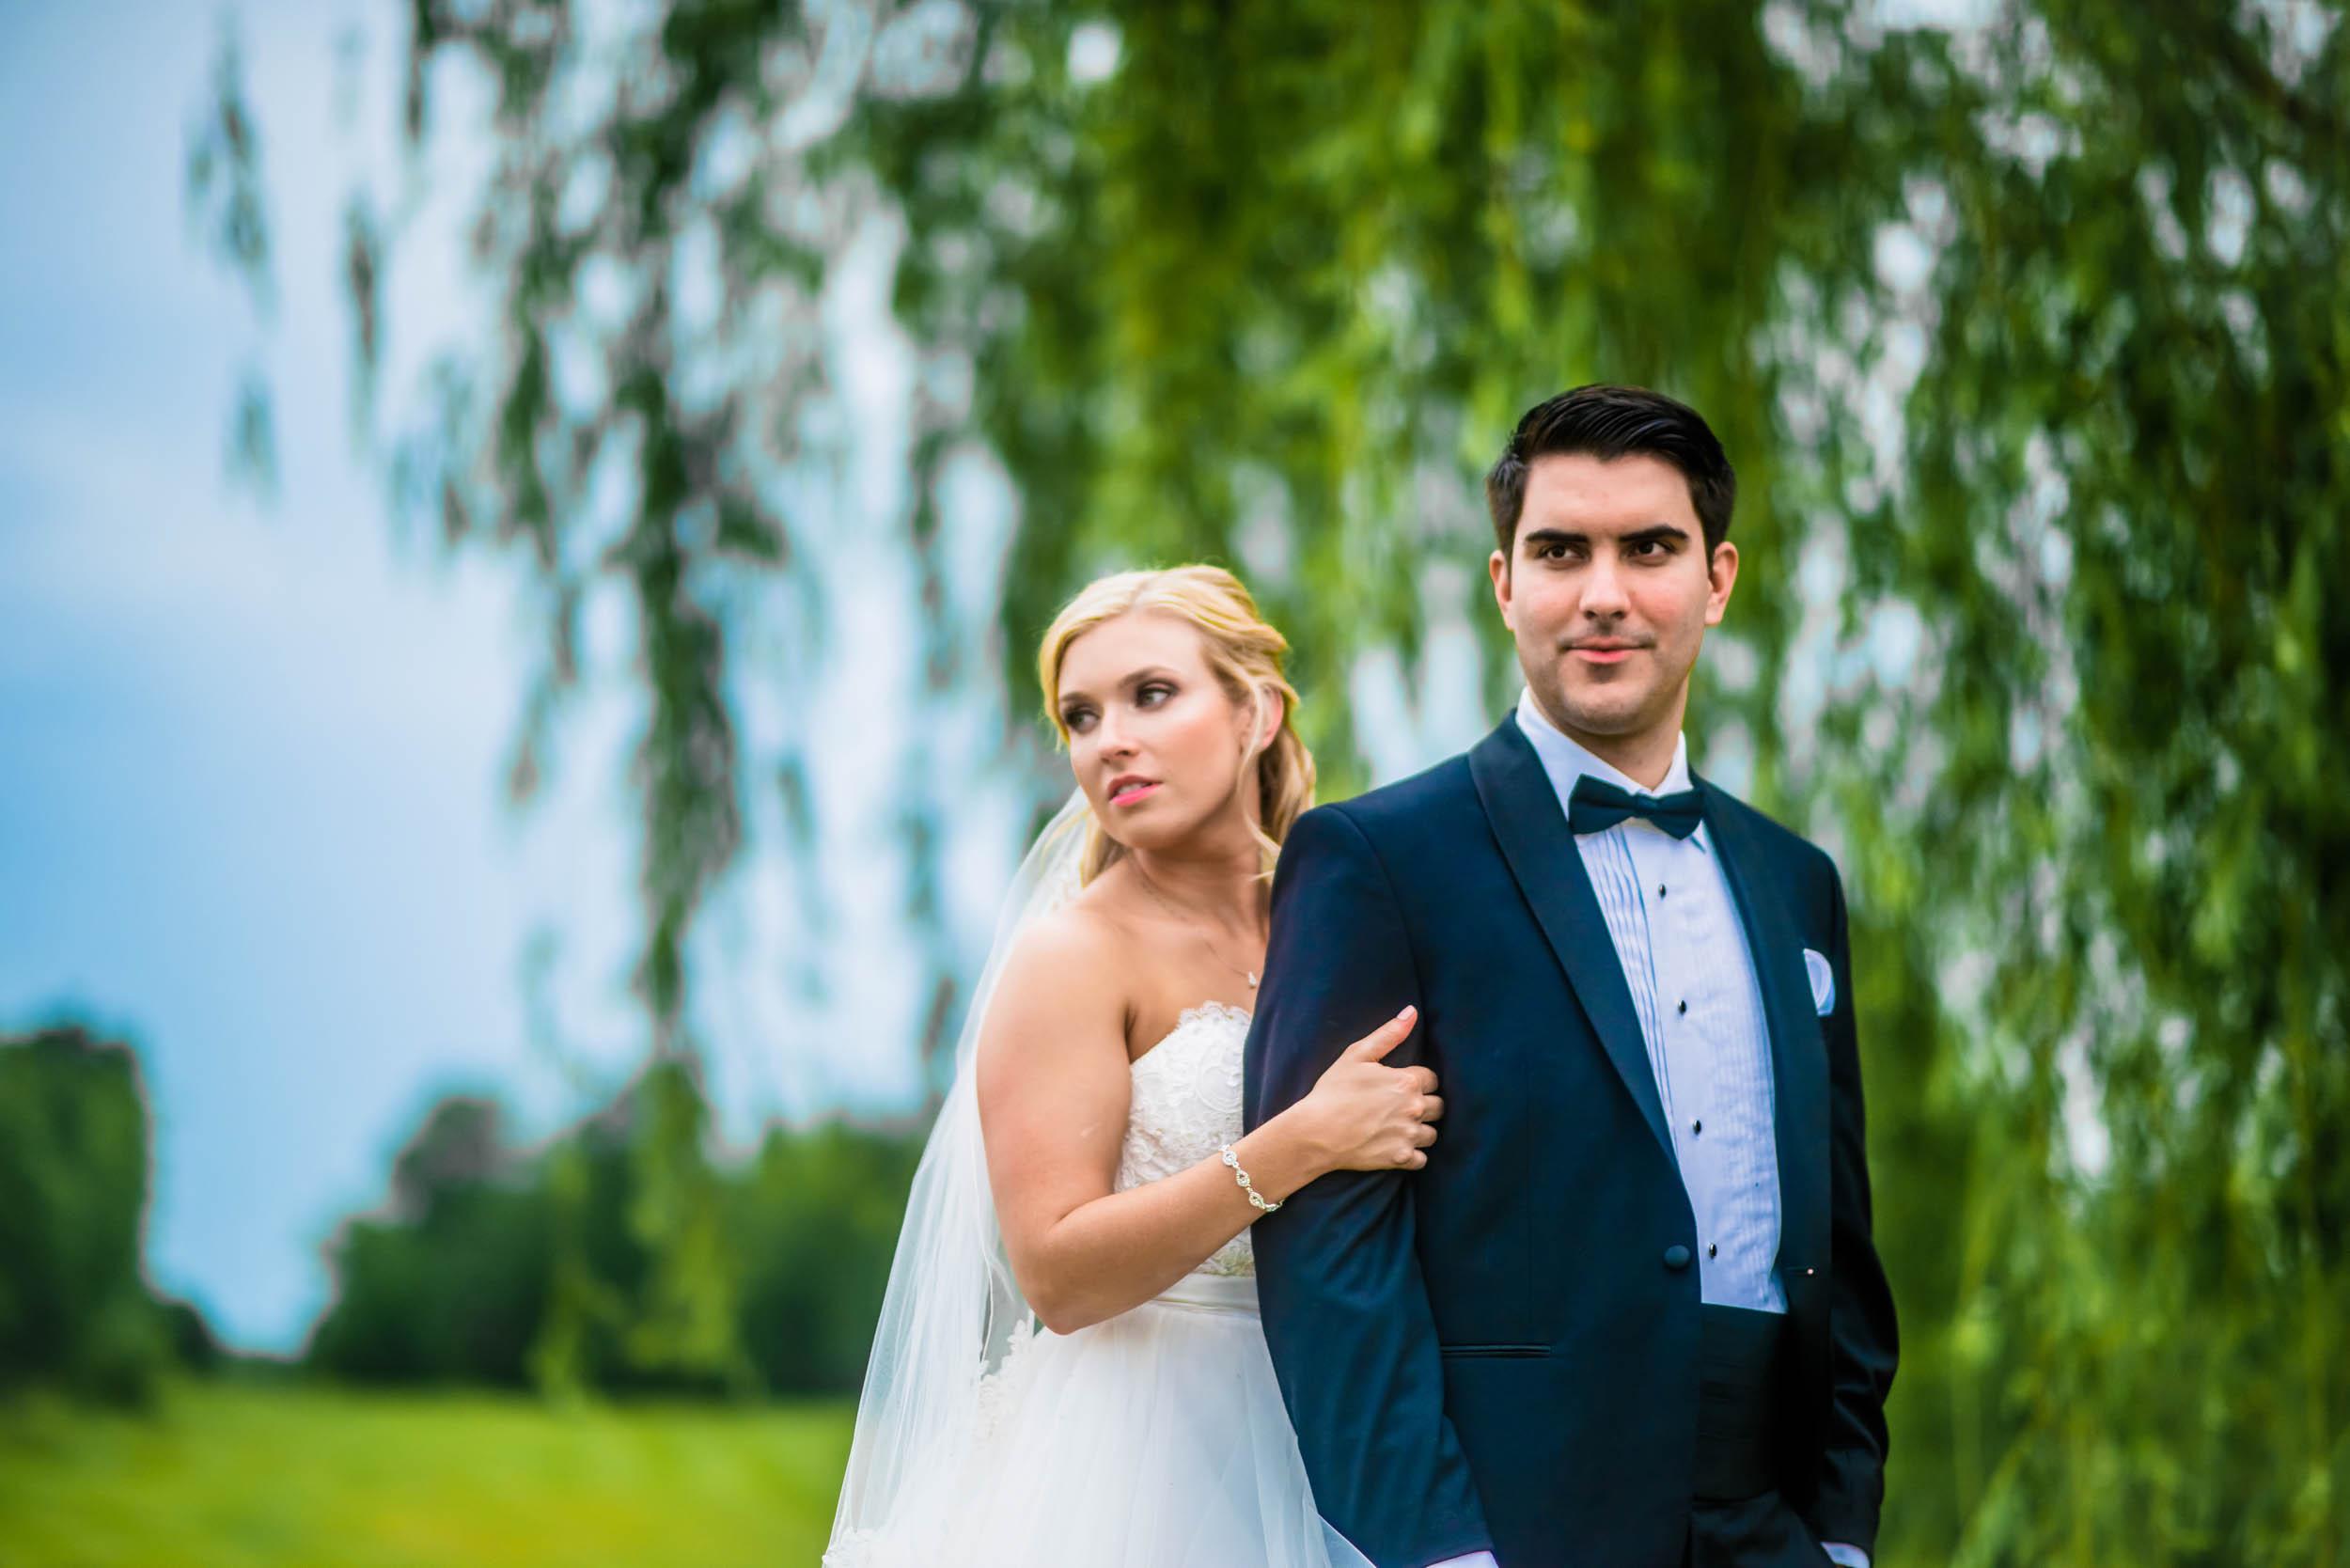 dc+metro+wedding+photographer+vadym+guliuk+photography+wedding+bride+and+groom-2070.jpg